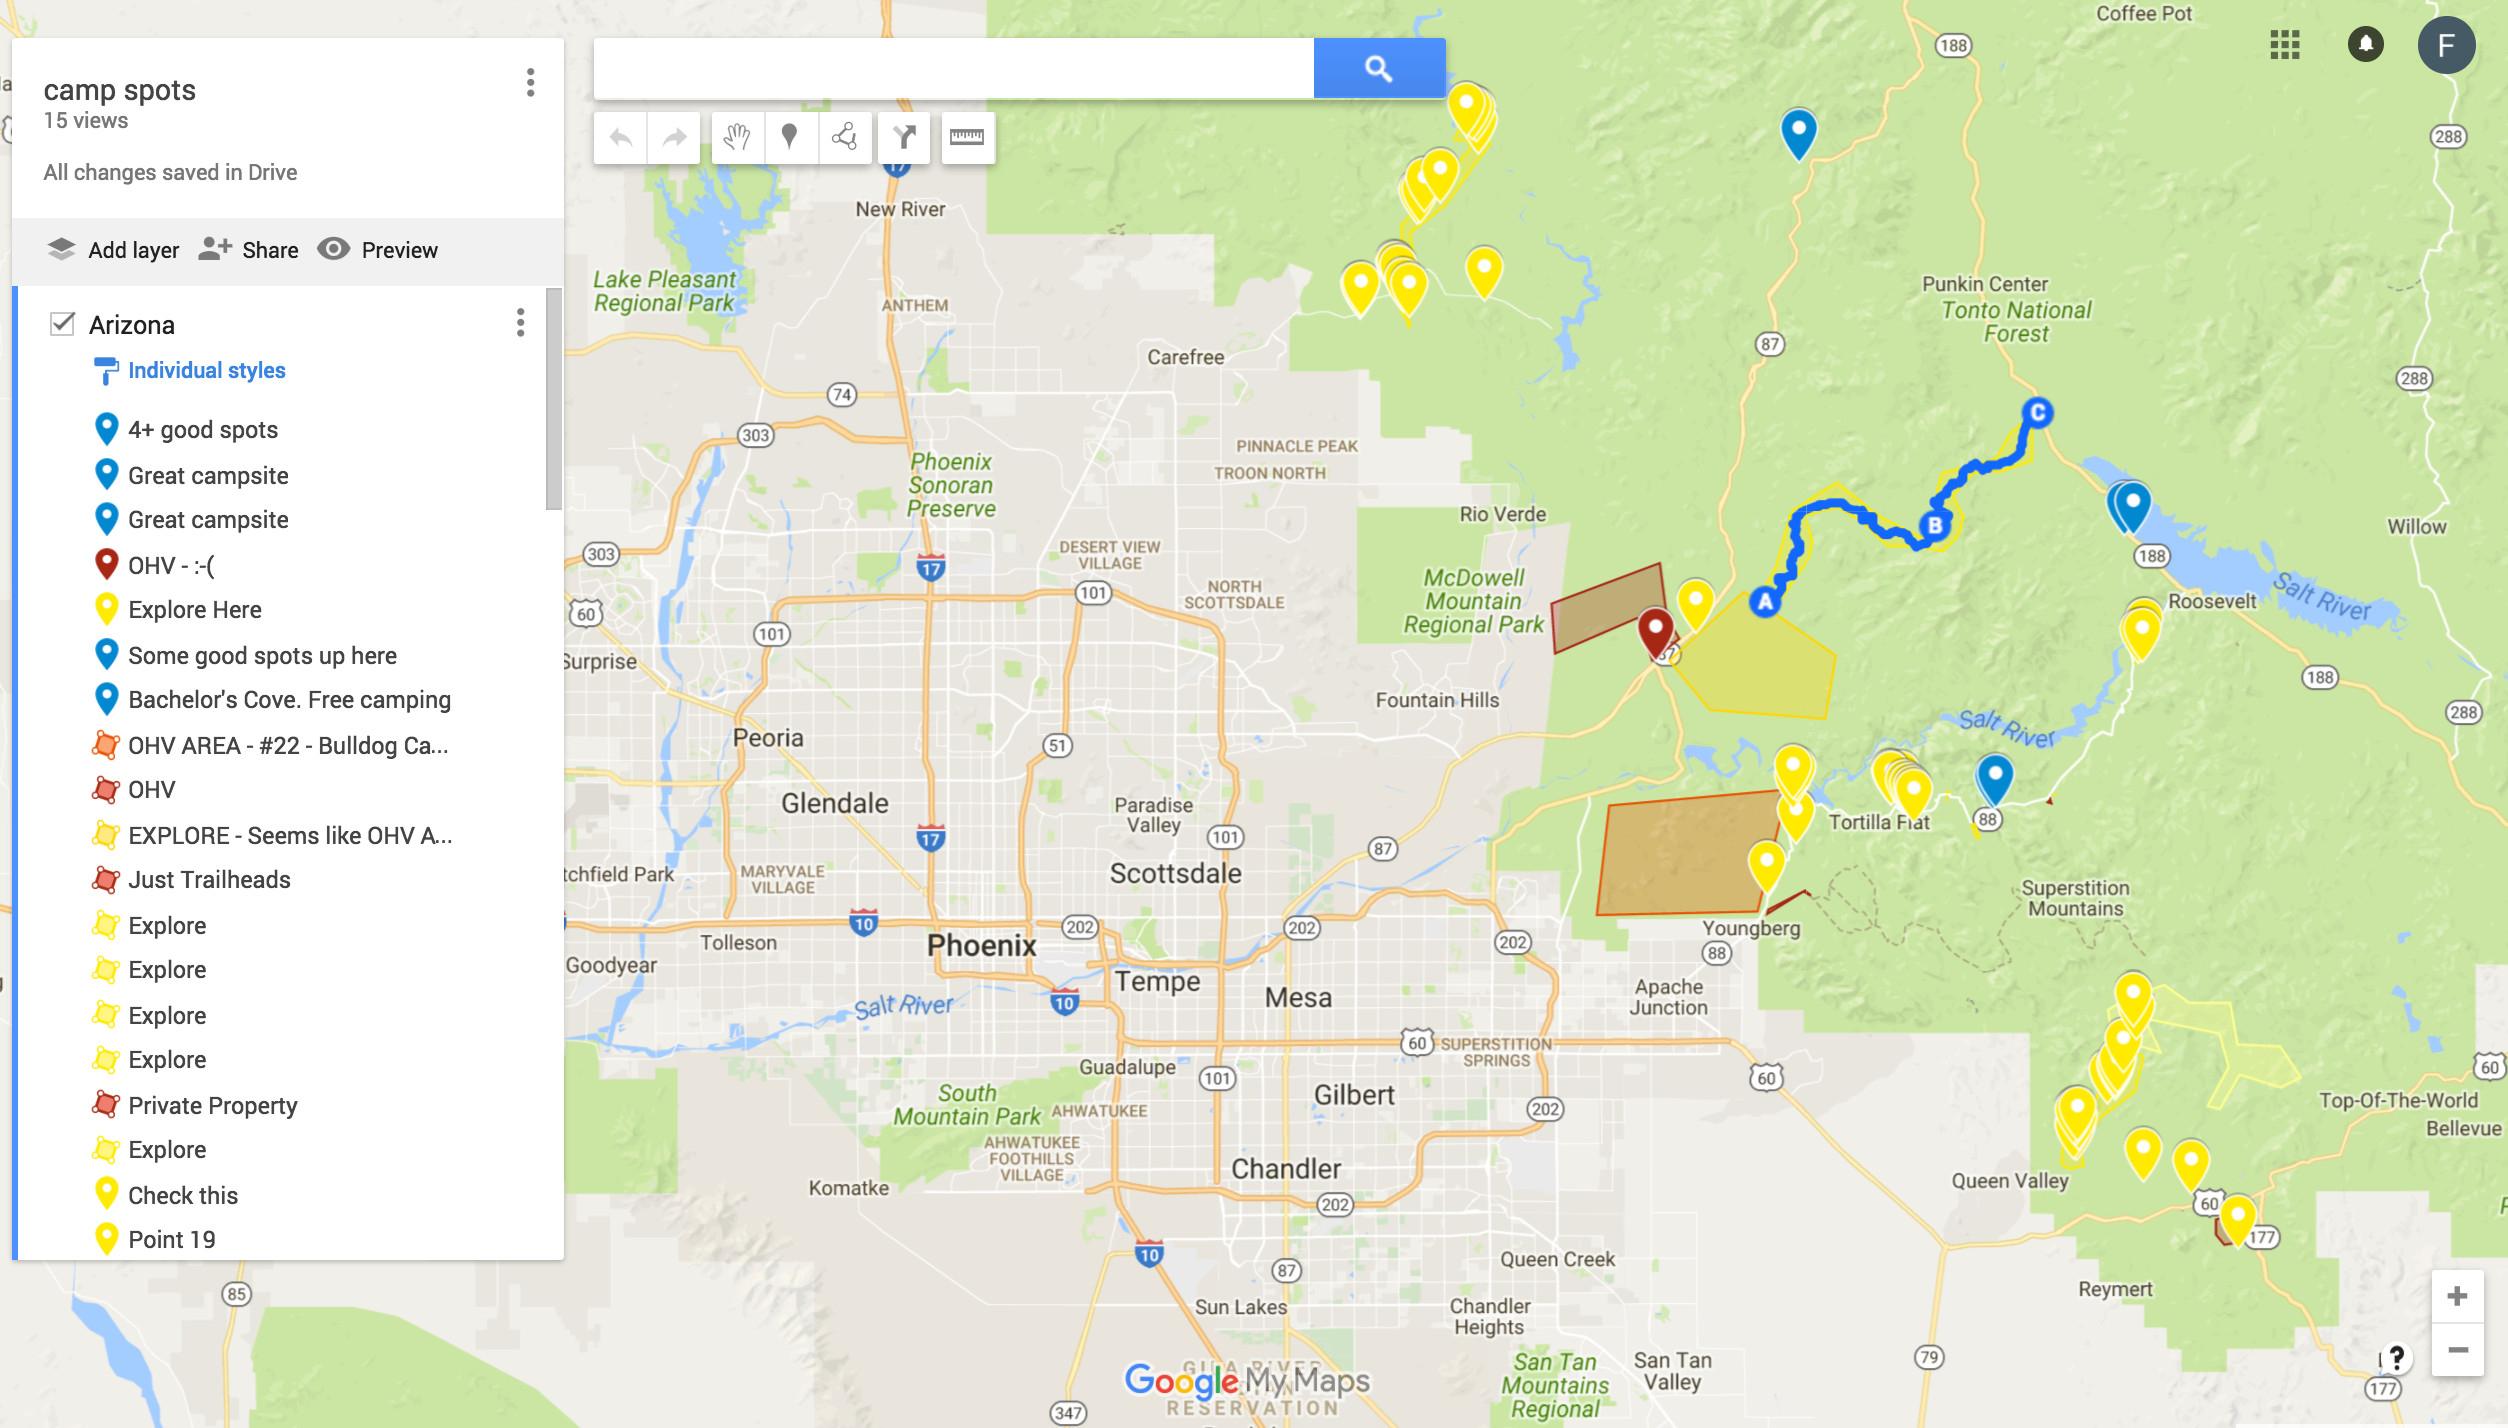 Charming California Google Maps - Ettcarworld - Charming California Google Maps